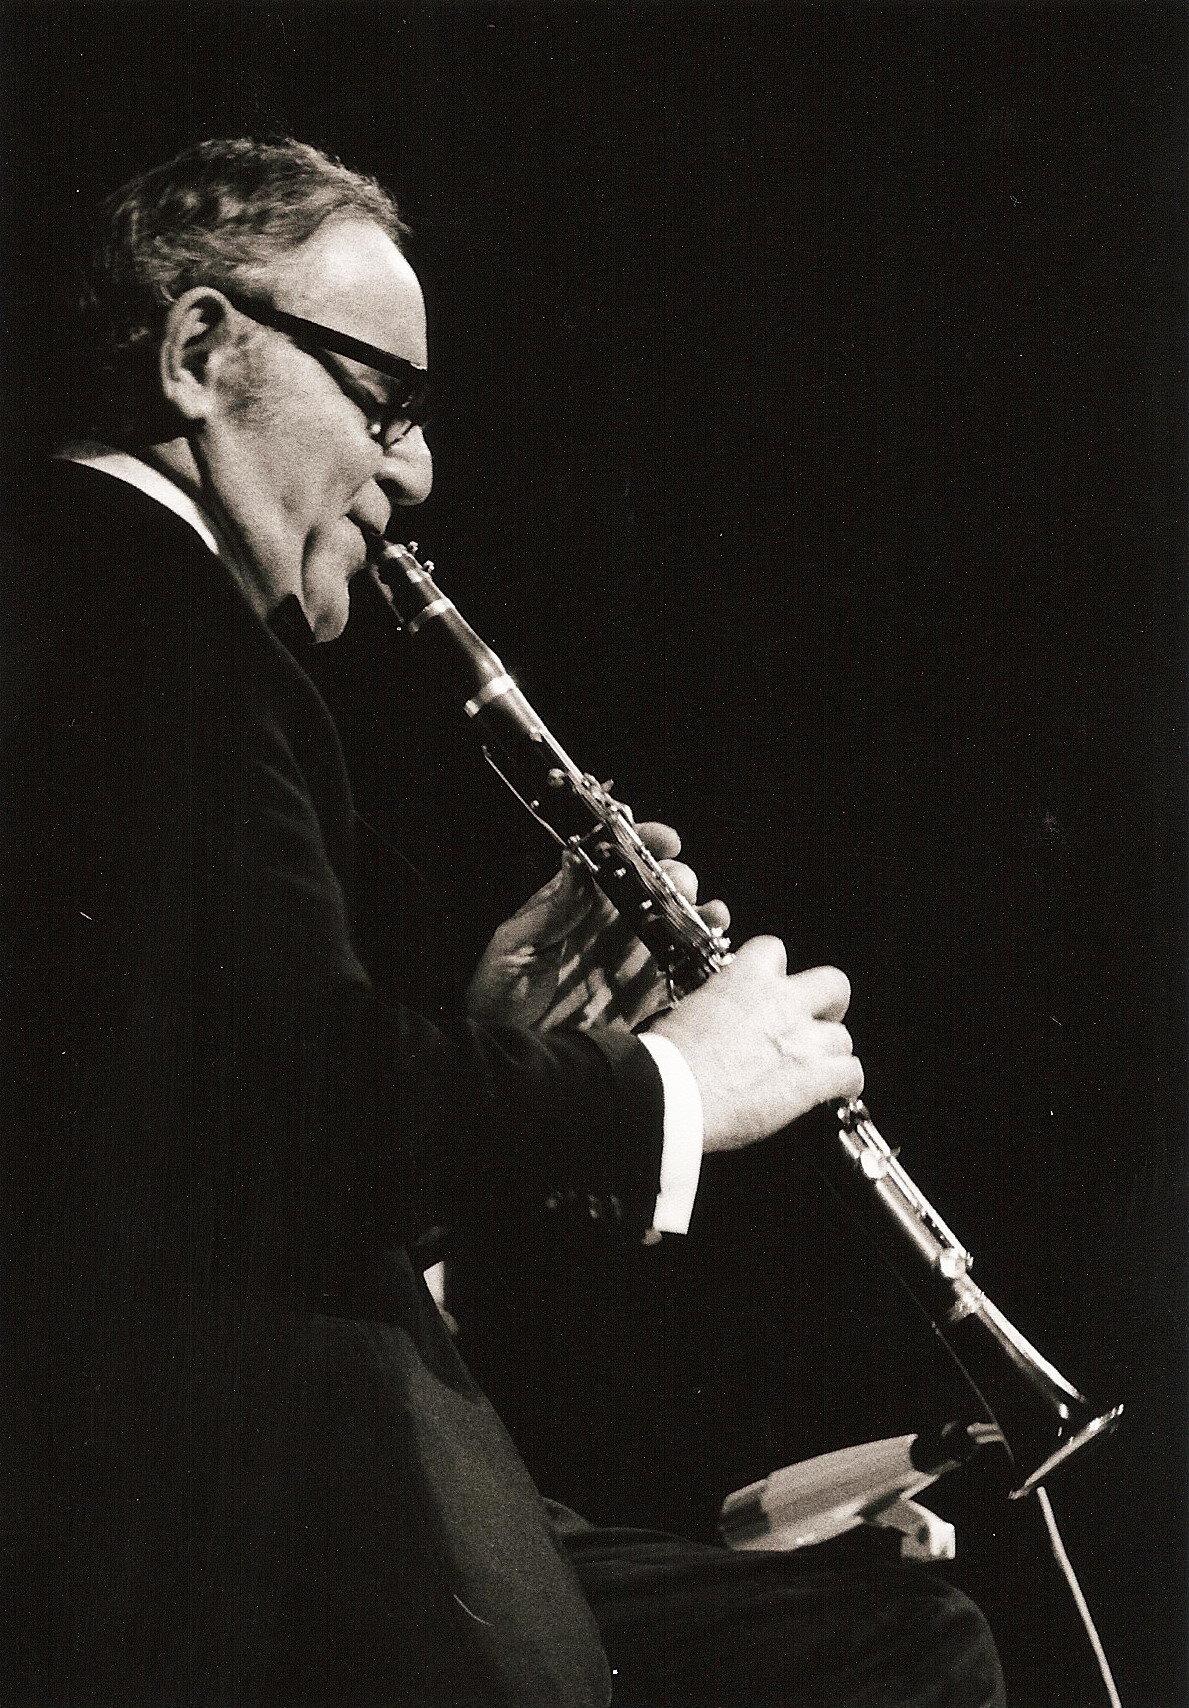 Benny Goodman in concert in Nuremberg, Germany 1971